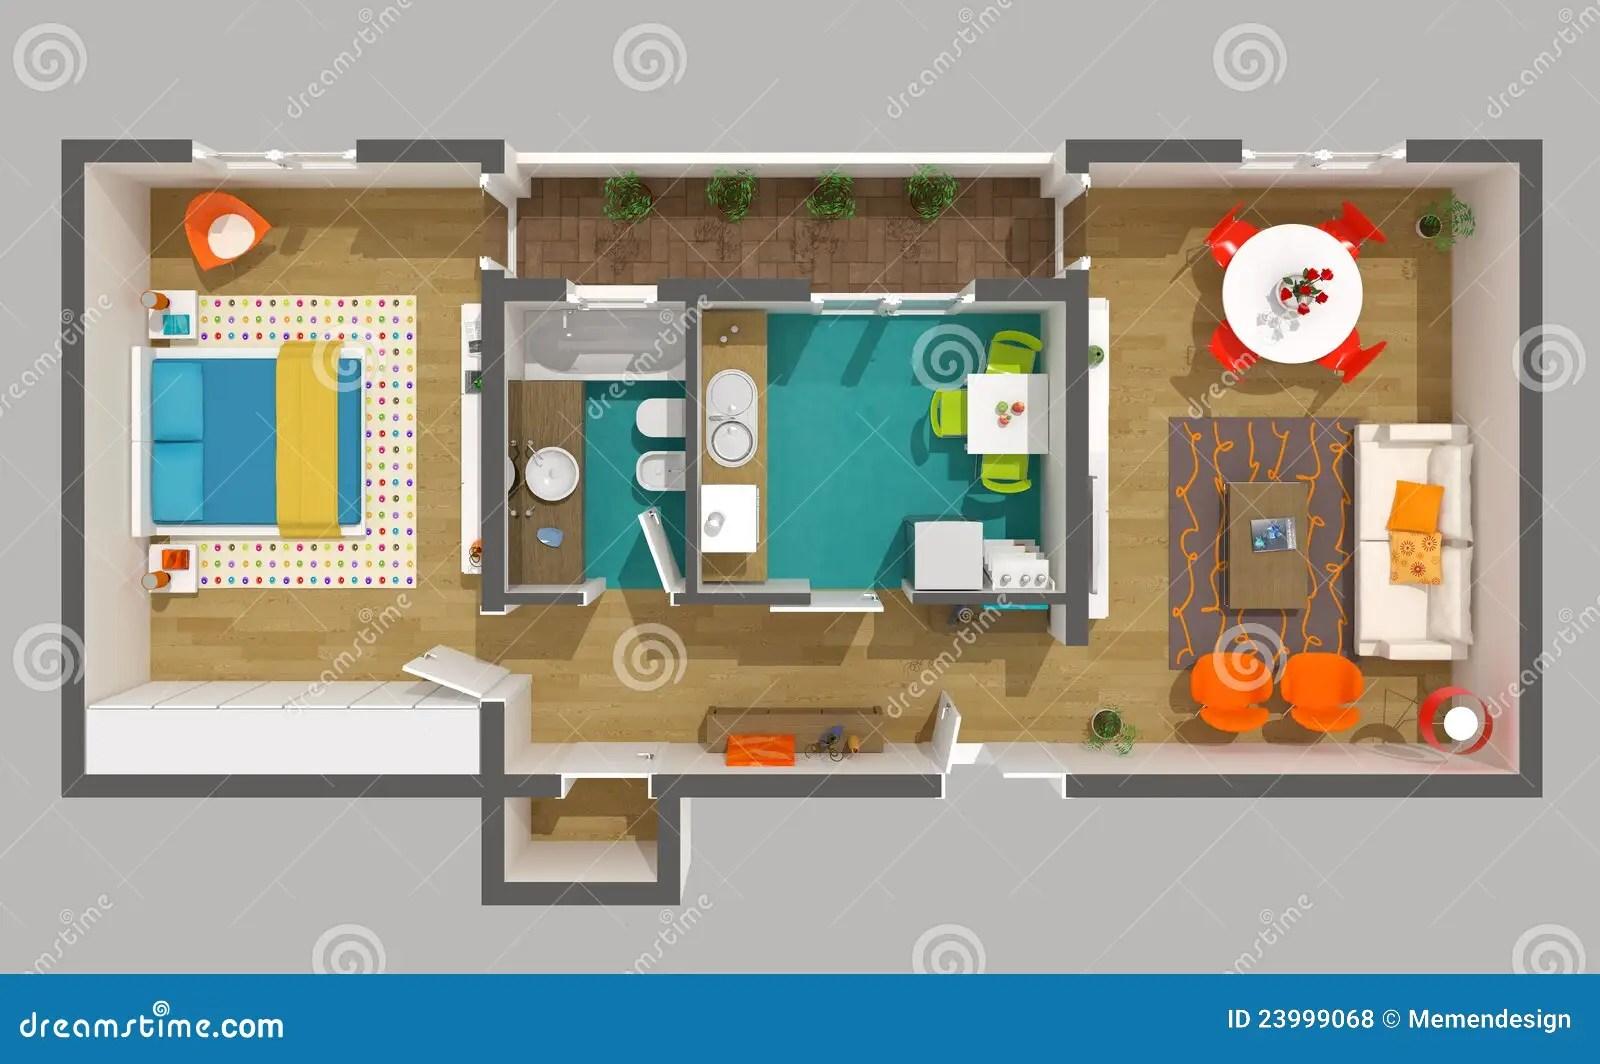 Architect 3d ultimate v17 free download for Innenarchitektur wo studieren